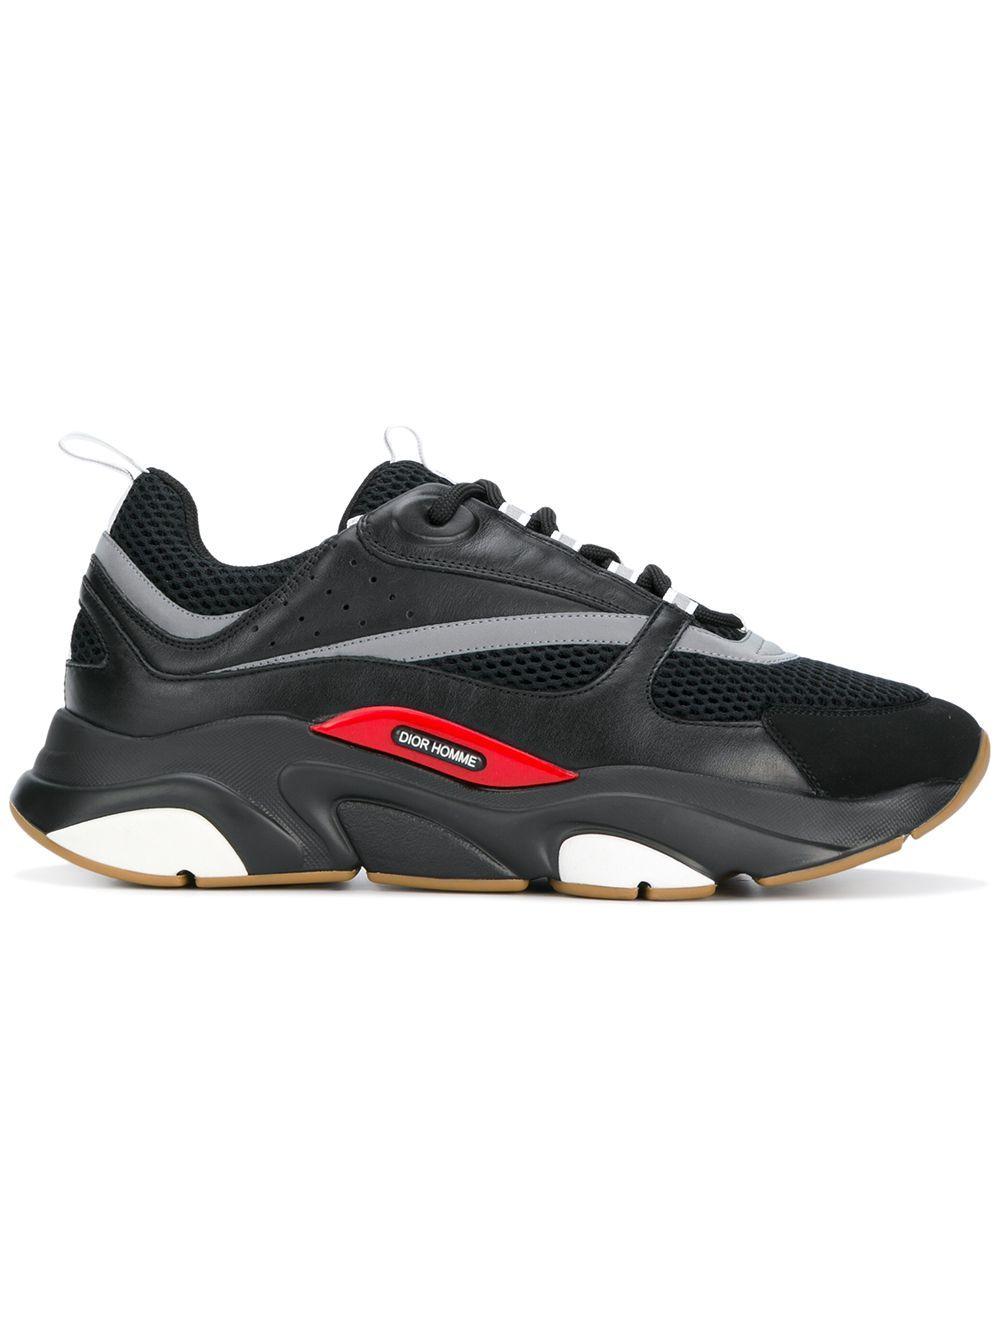 Dior B22 休闲运动鞋 In Black   ModeSens